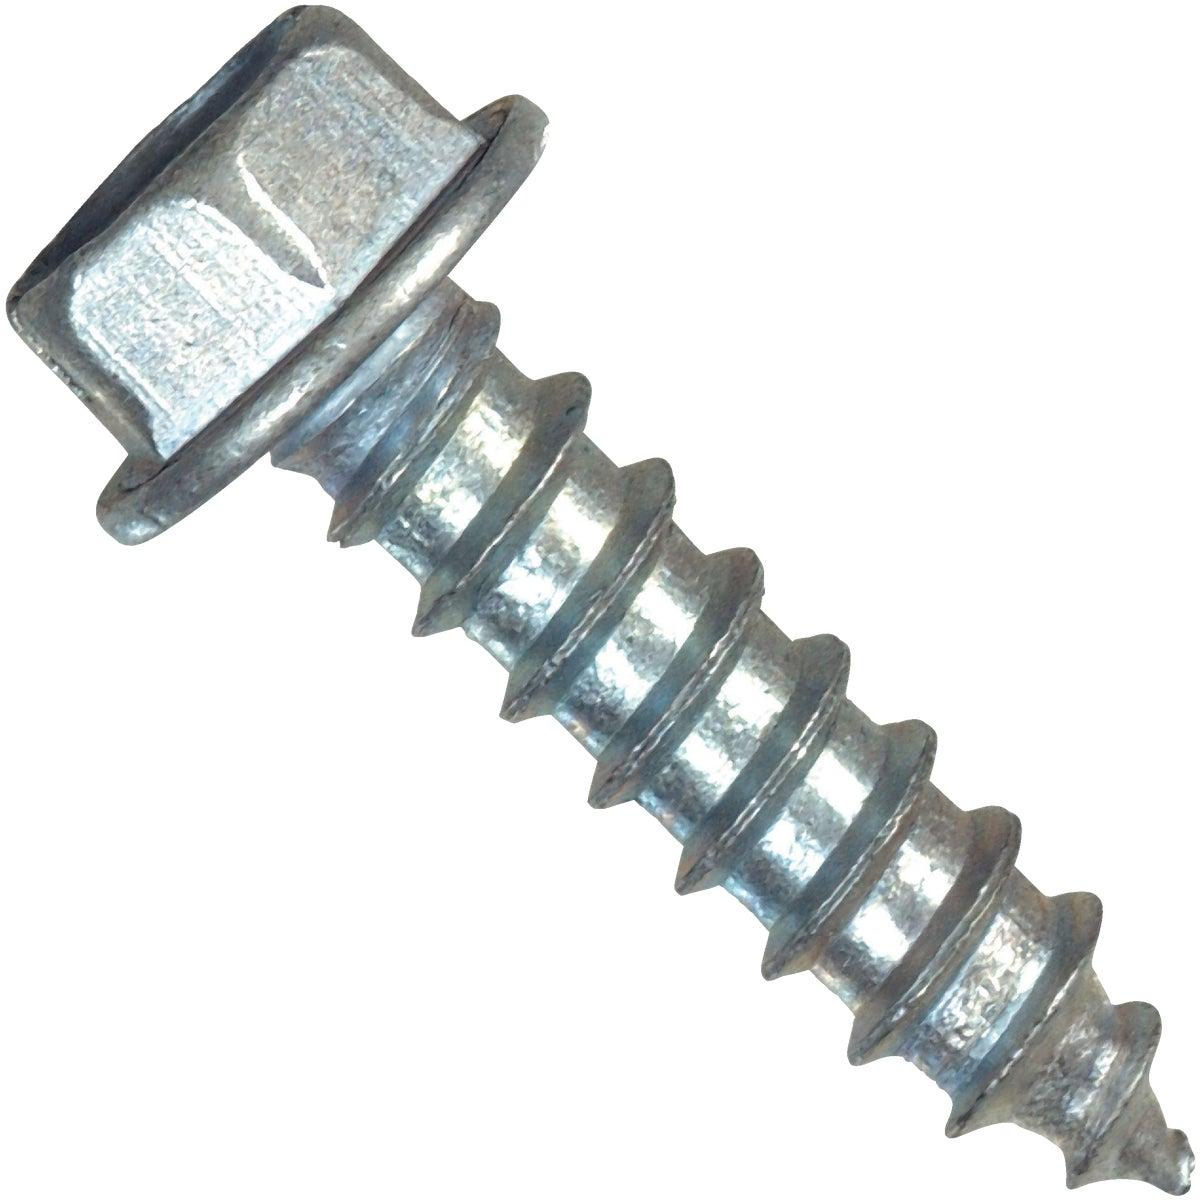 6X3/4 HWH SHT MTL SCREW - 70256 by Hillman Fastener